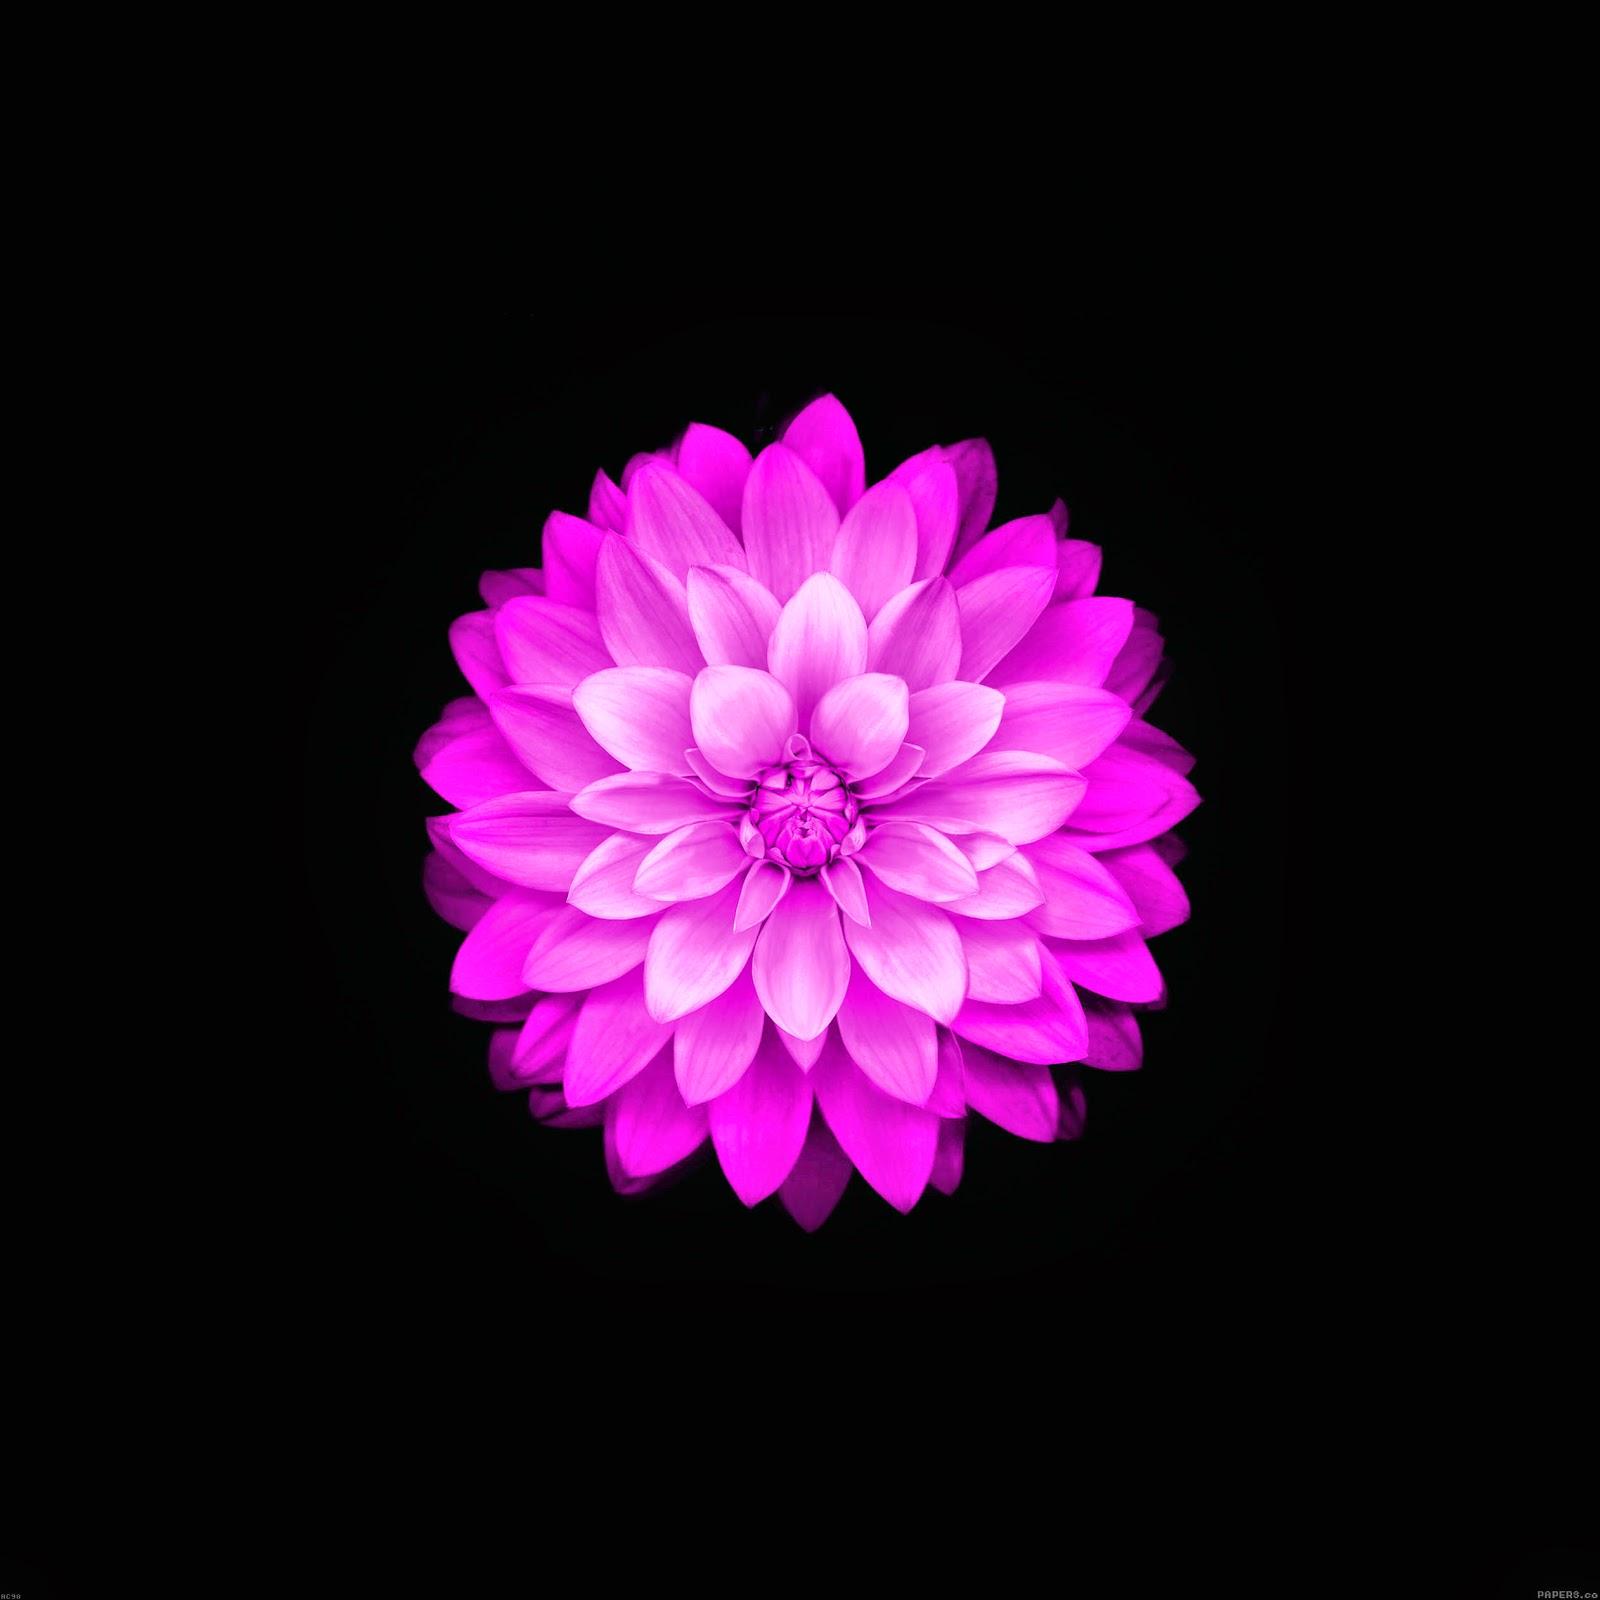 Ios 9 Wallpaper Flower Flowers Healthy